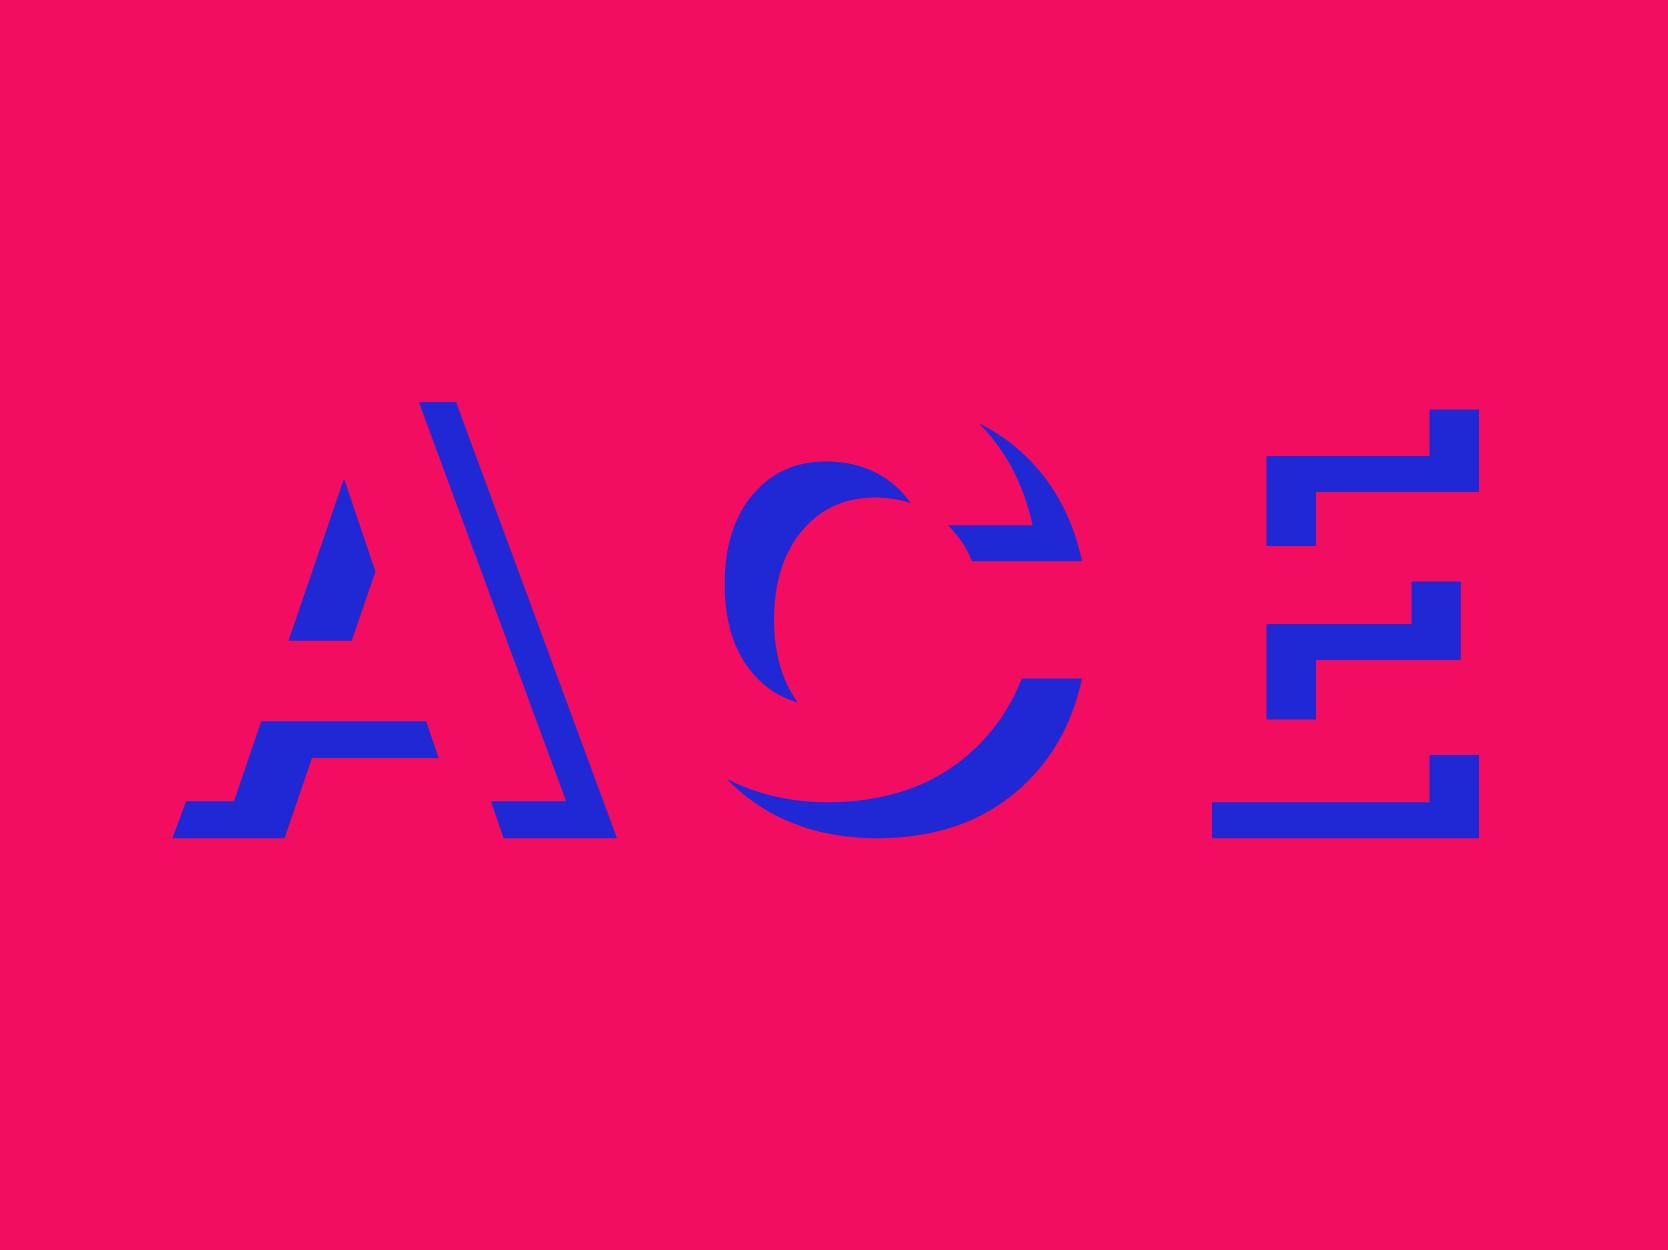 Ace dribbble logo 03